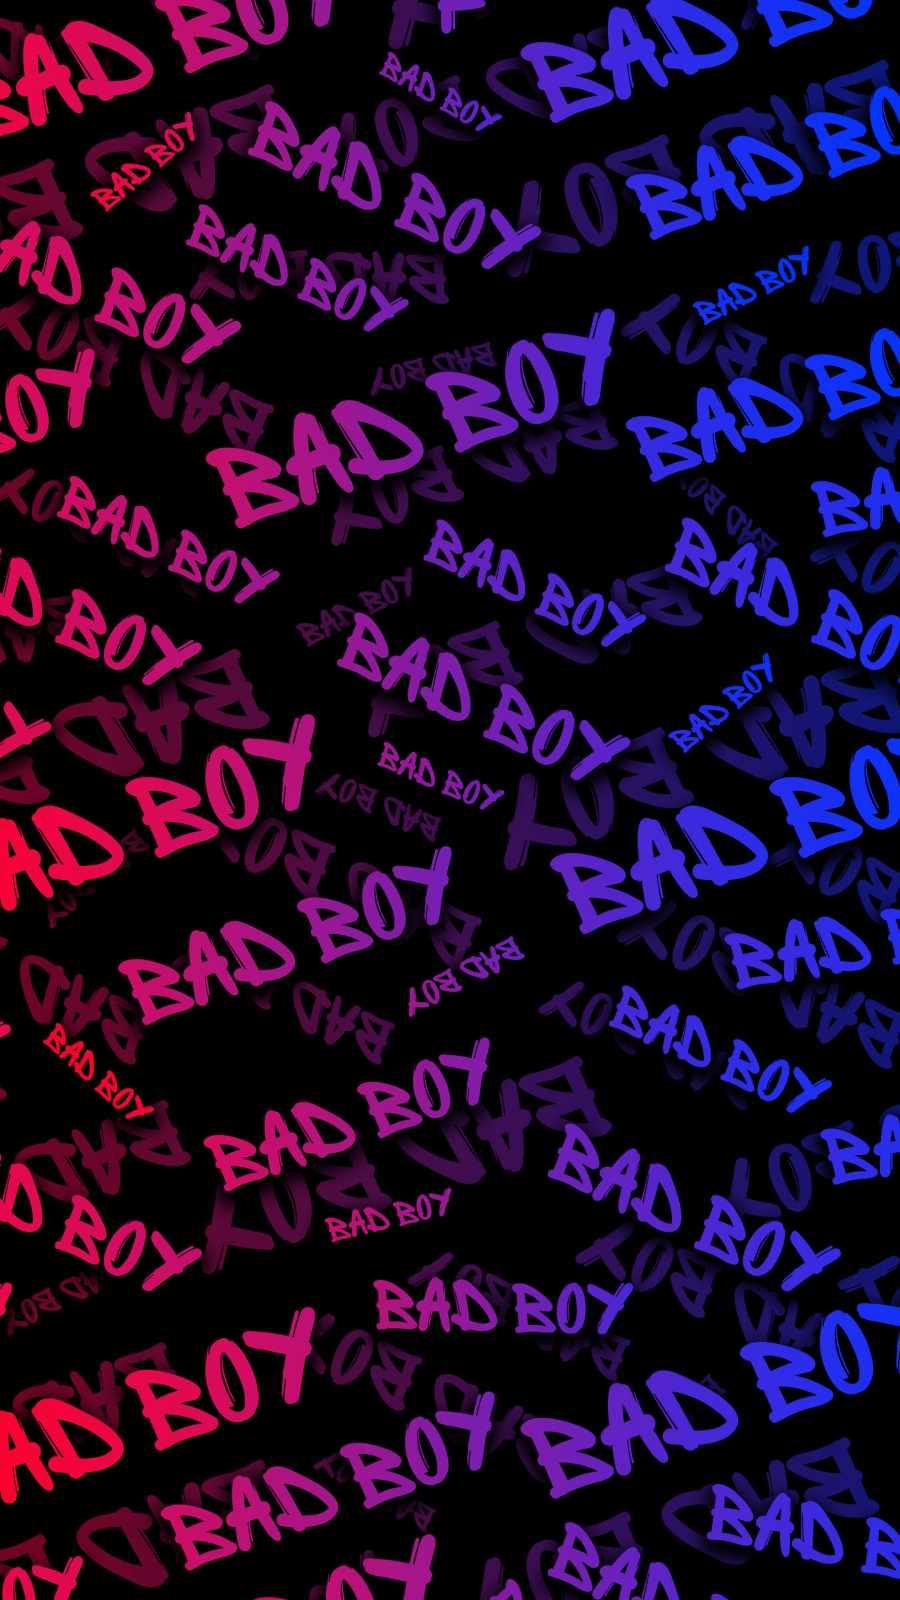 Bad Boy iPhone Wallpaper